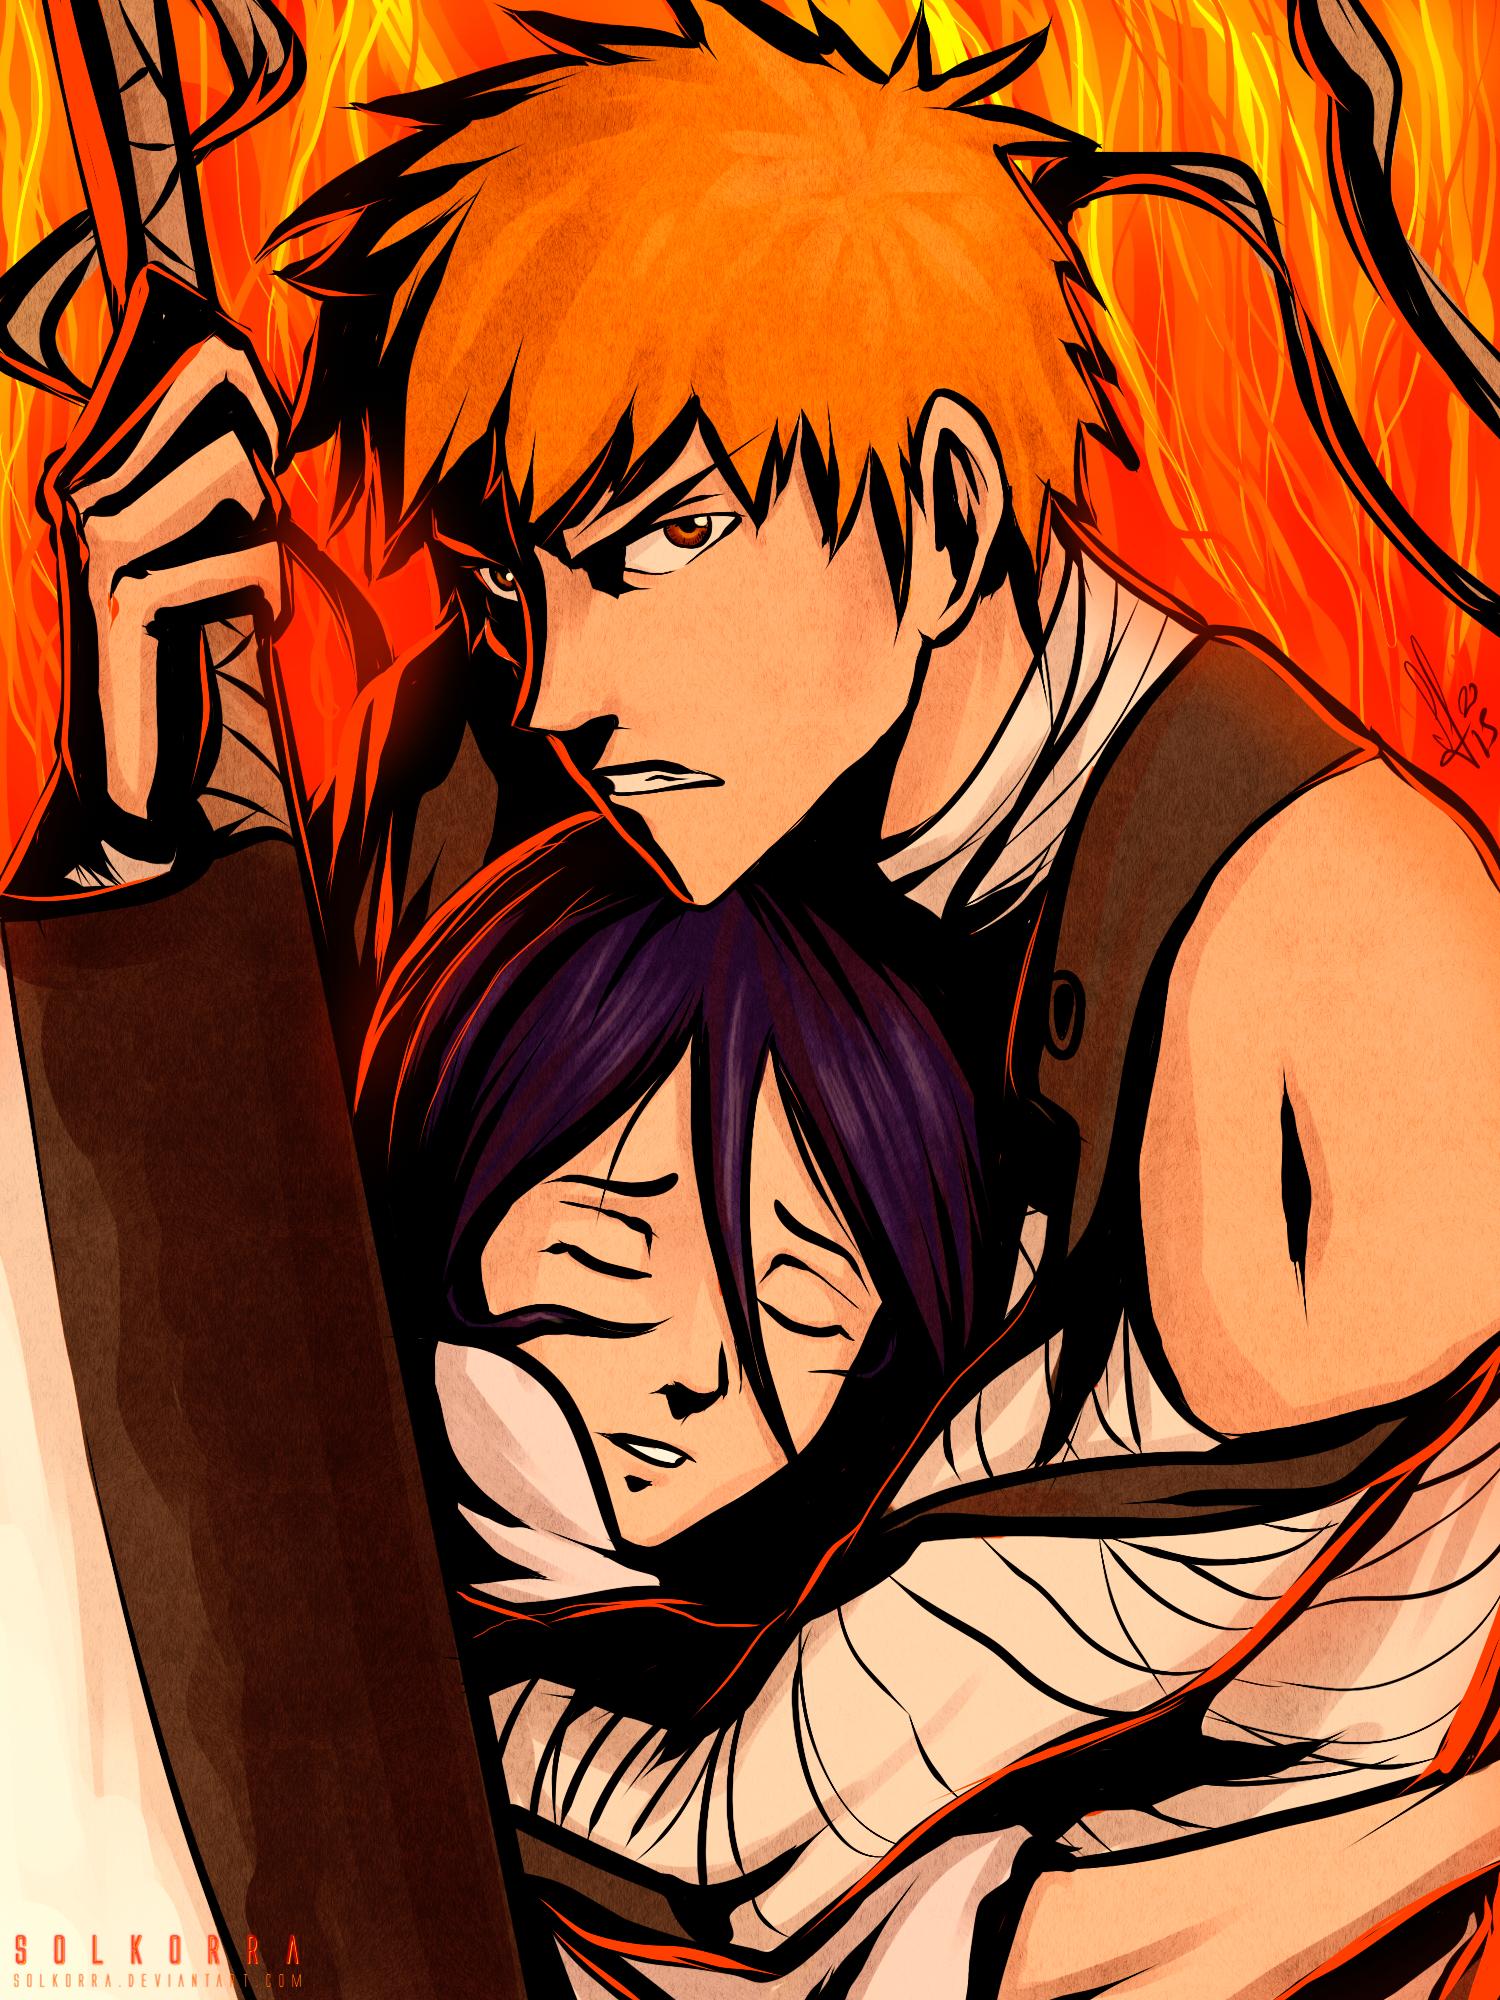 Ichigo and Rukia: Save Me by SolKorra